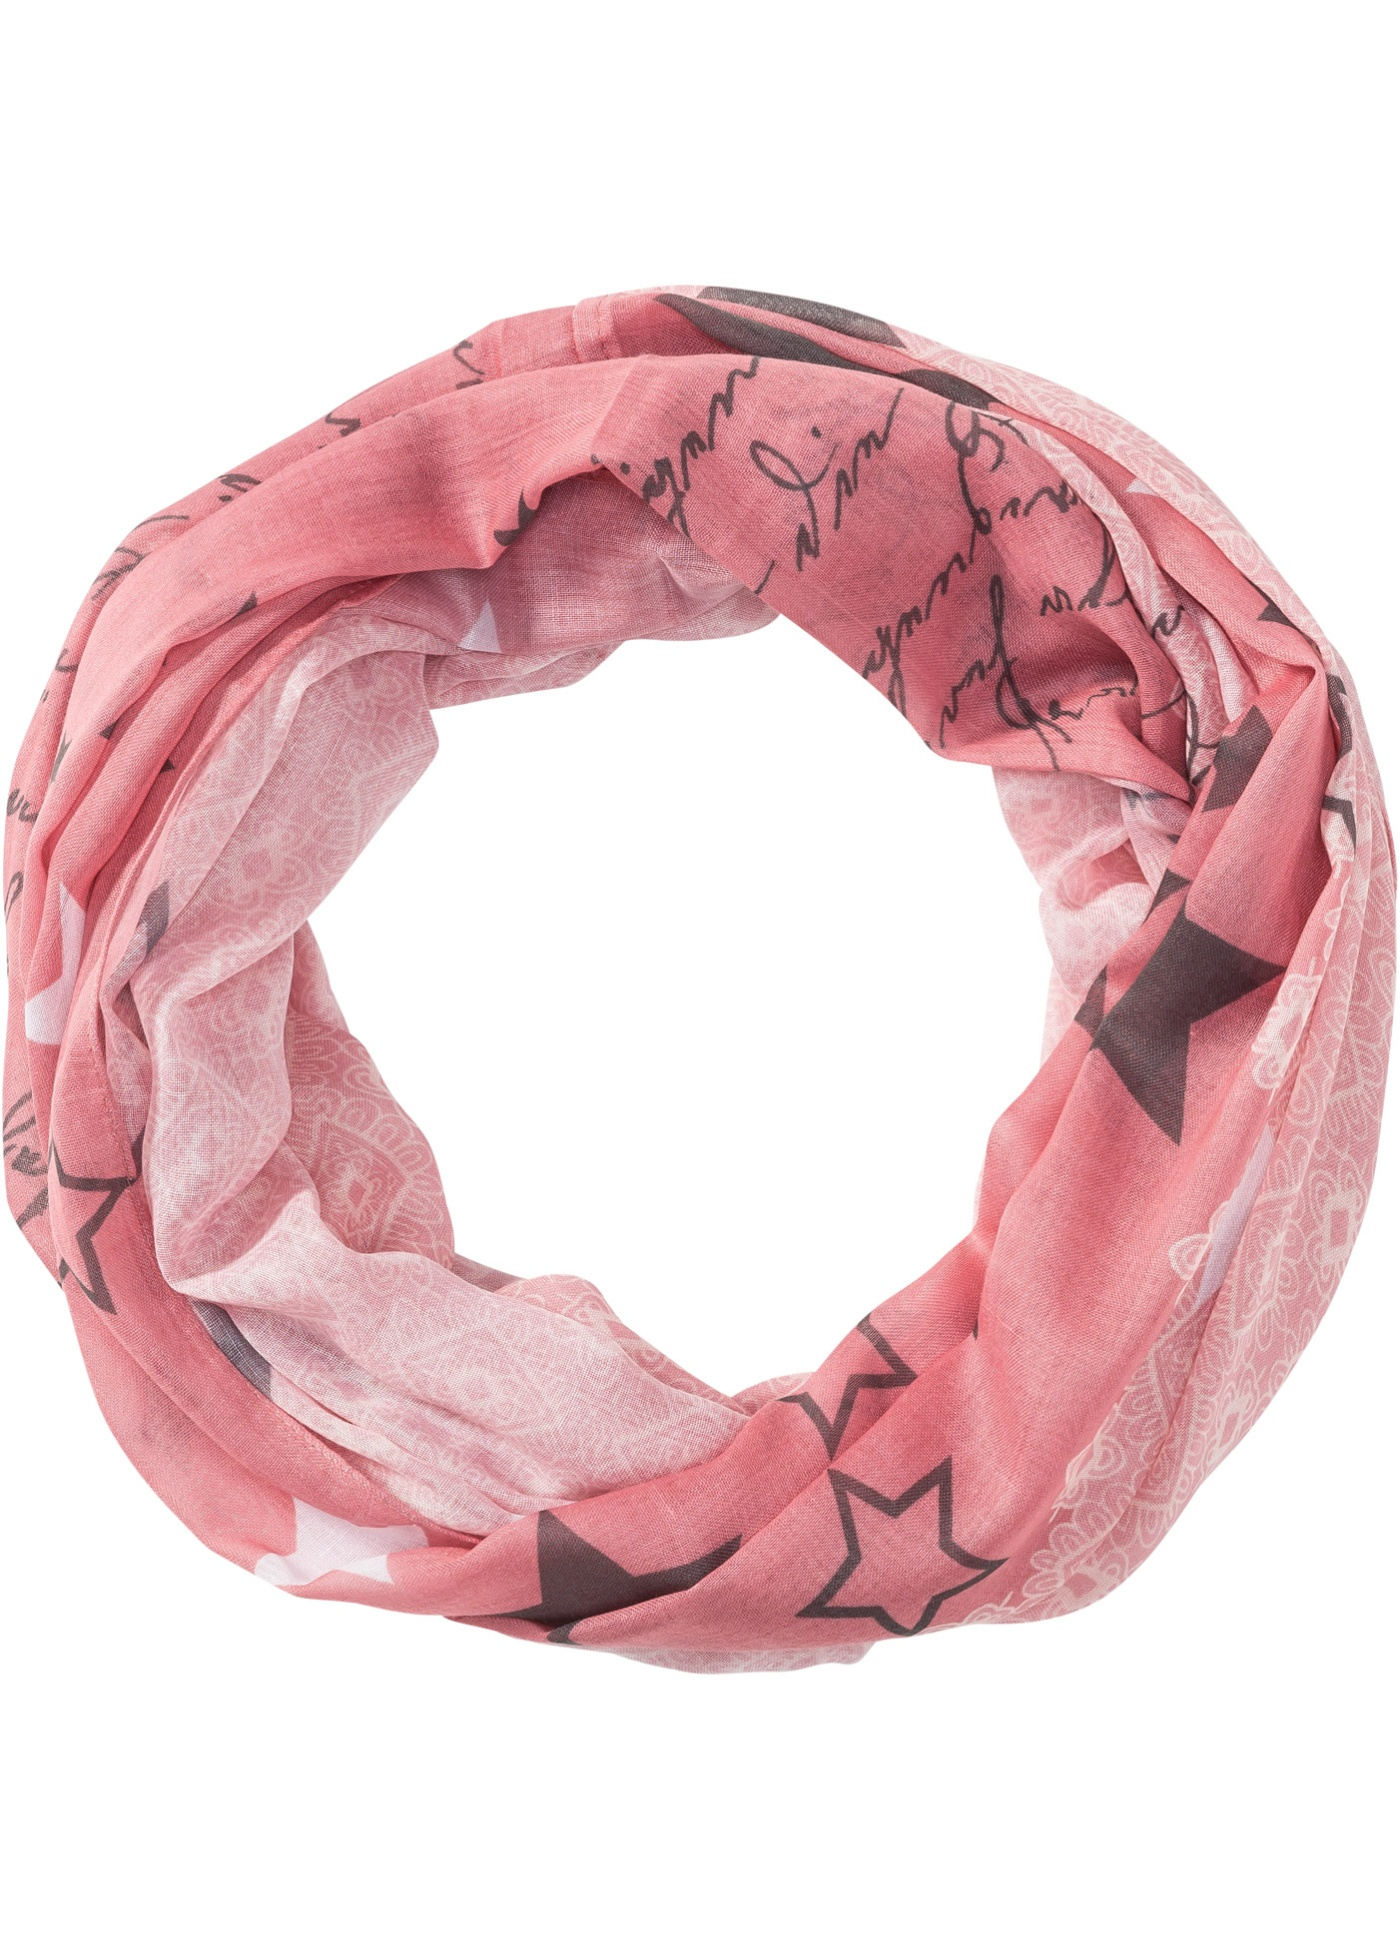 Nekonečná šála - Růžová 5e5c16fed0